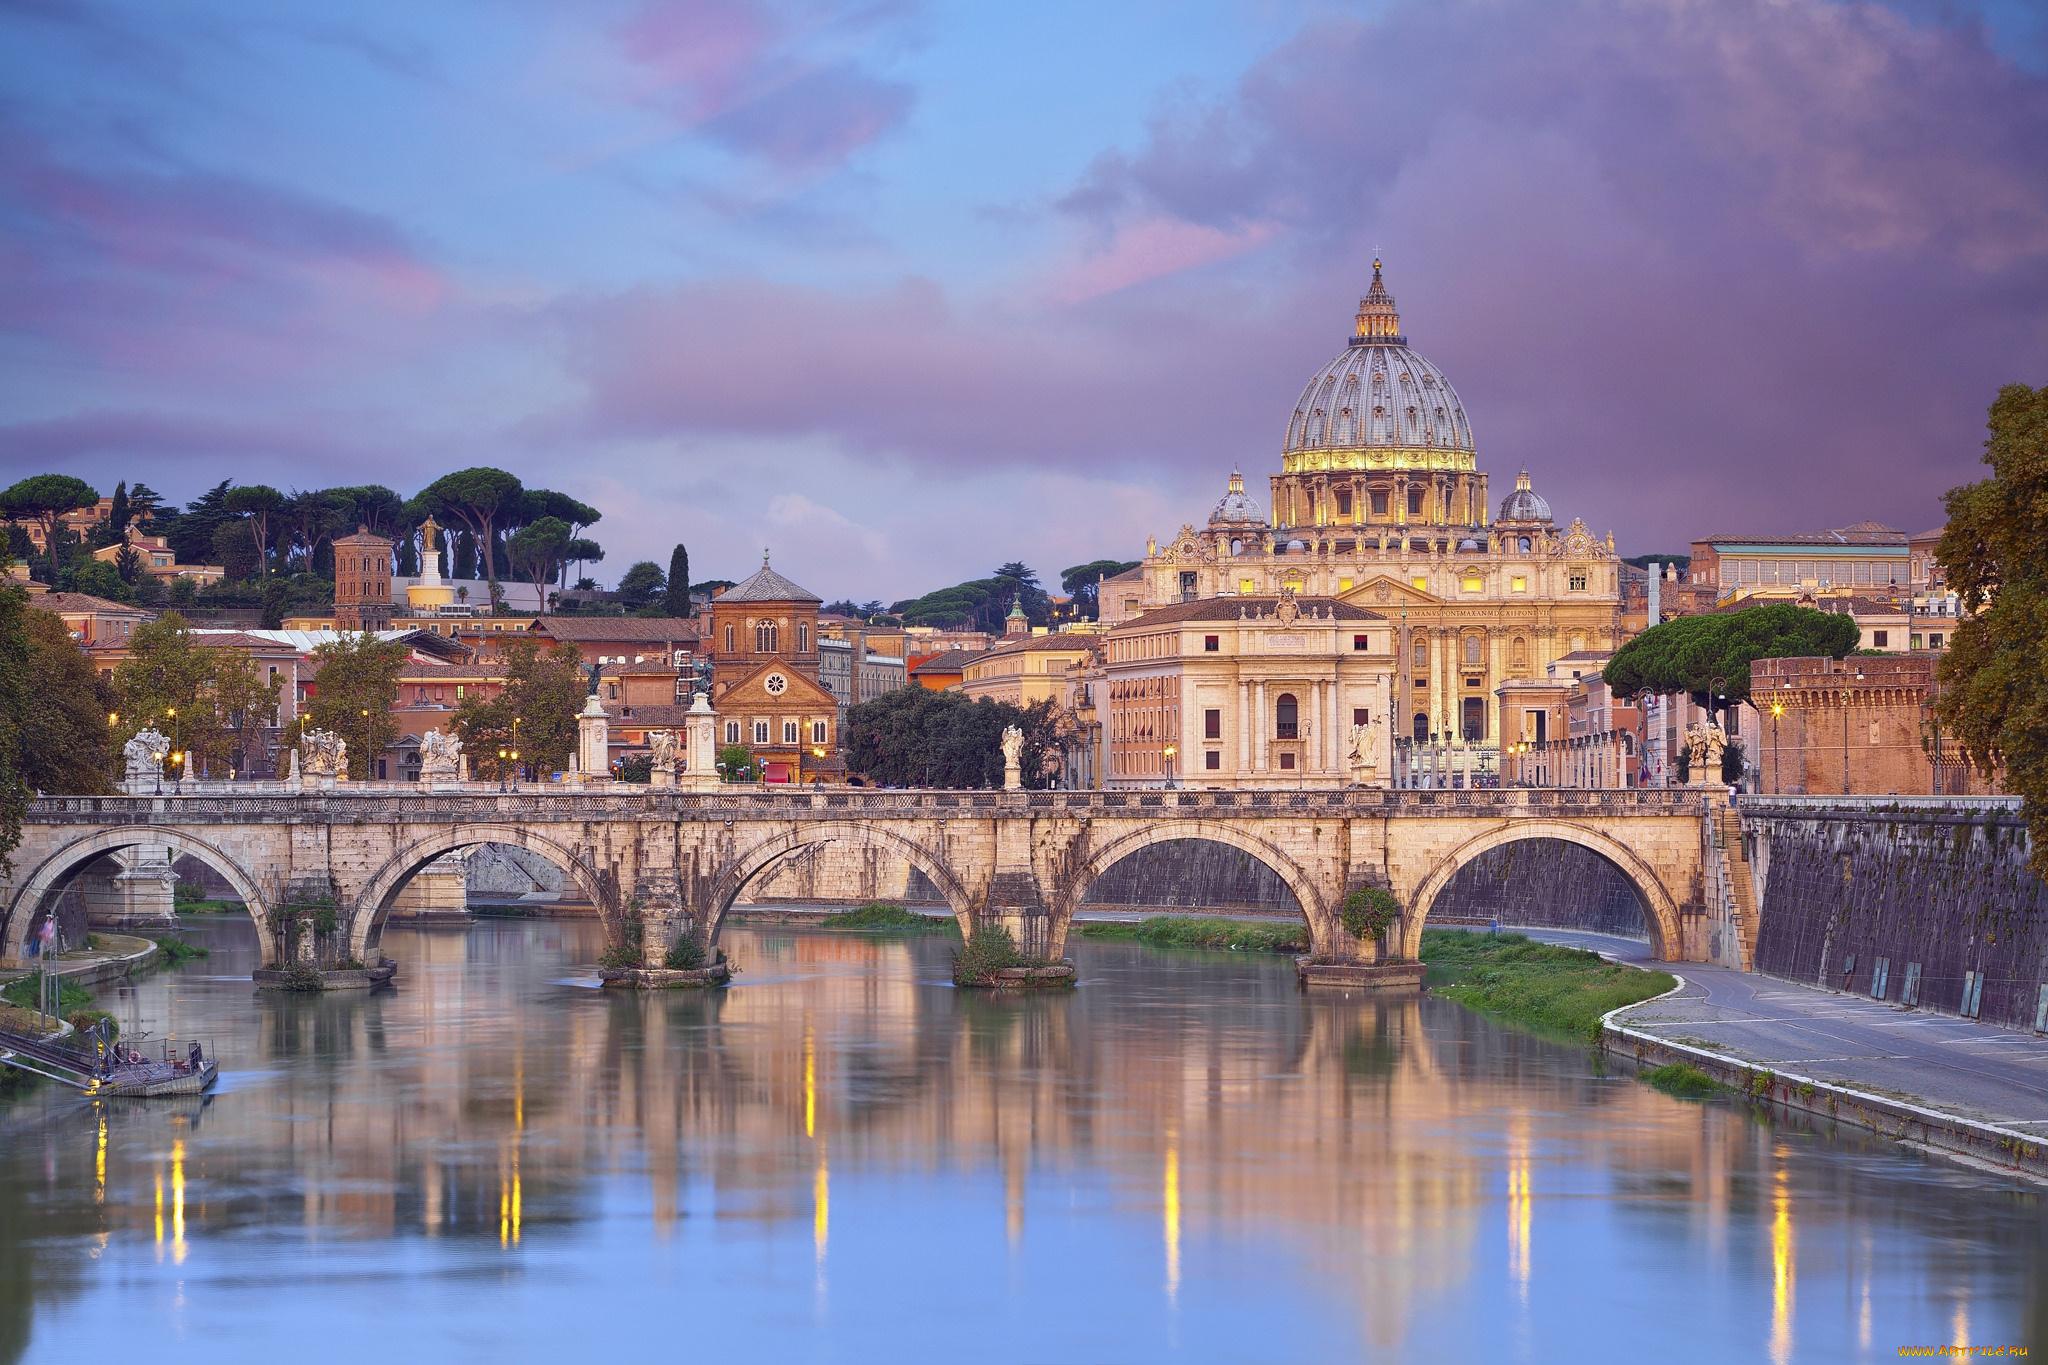 The Vatican Seen Past the Tiber River, Rome, Italy скачать